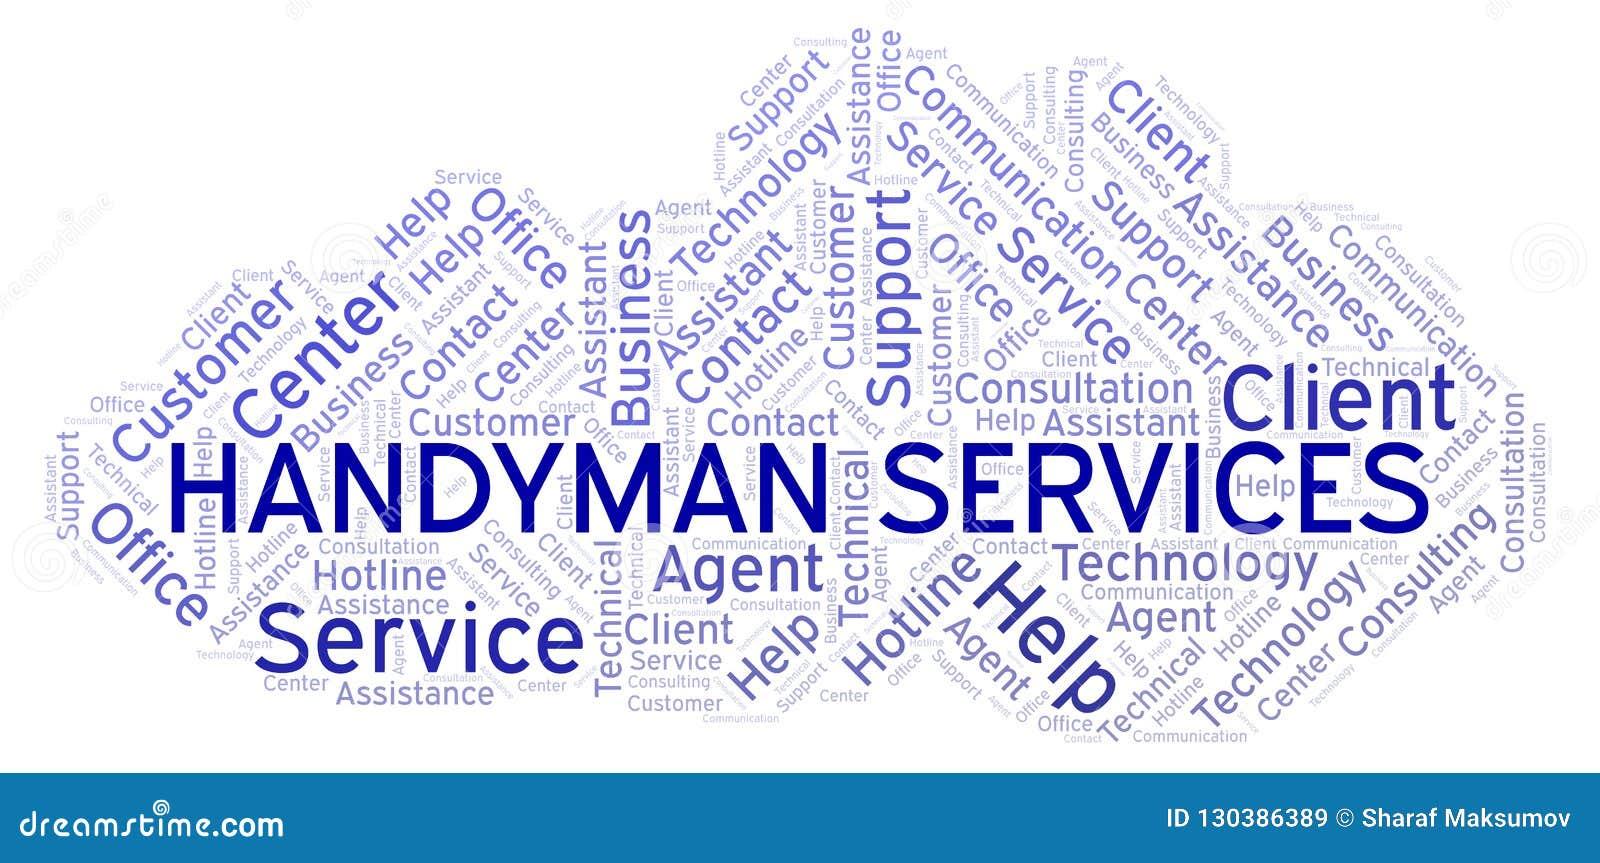 Handyman Services word cloud.